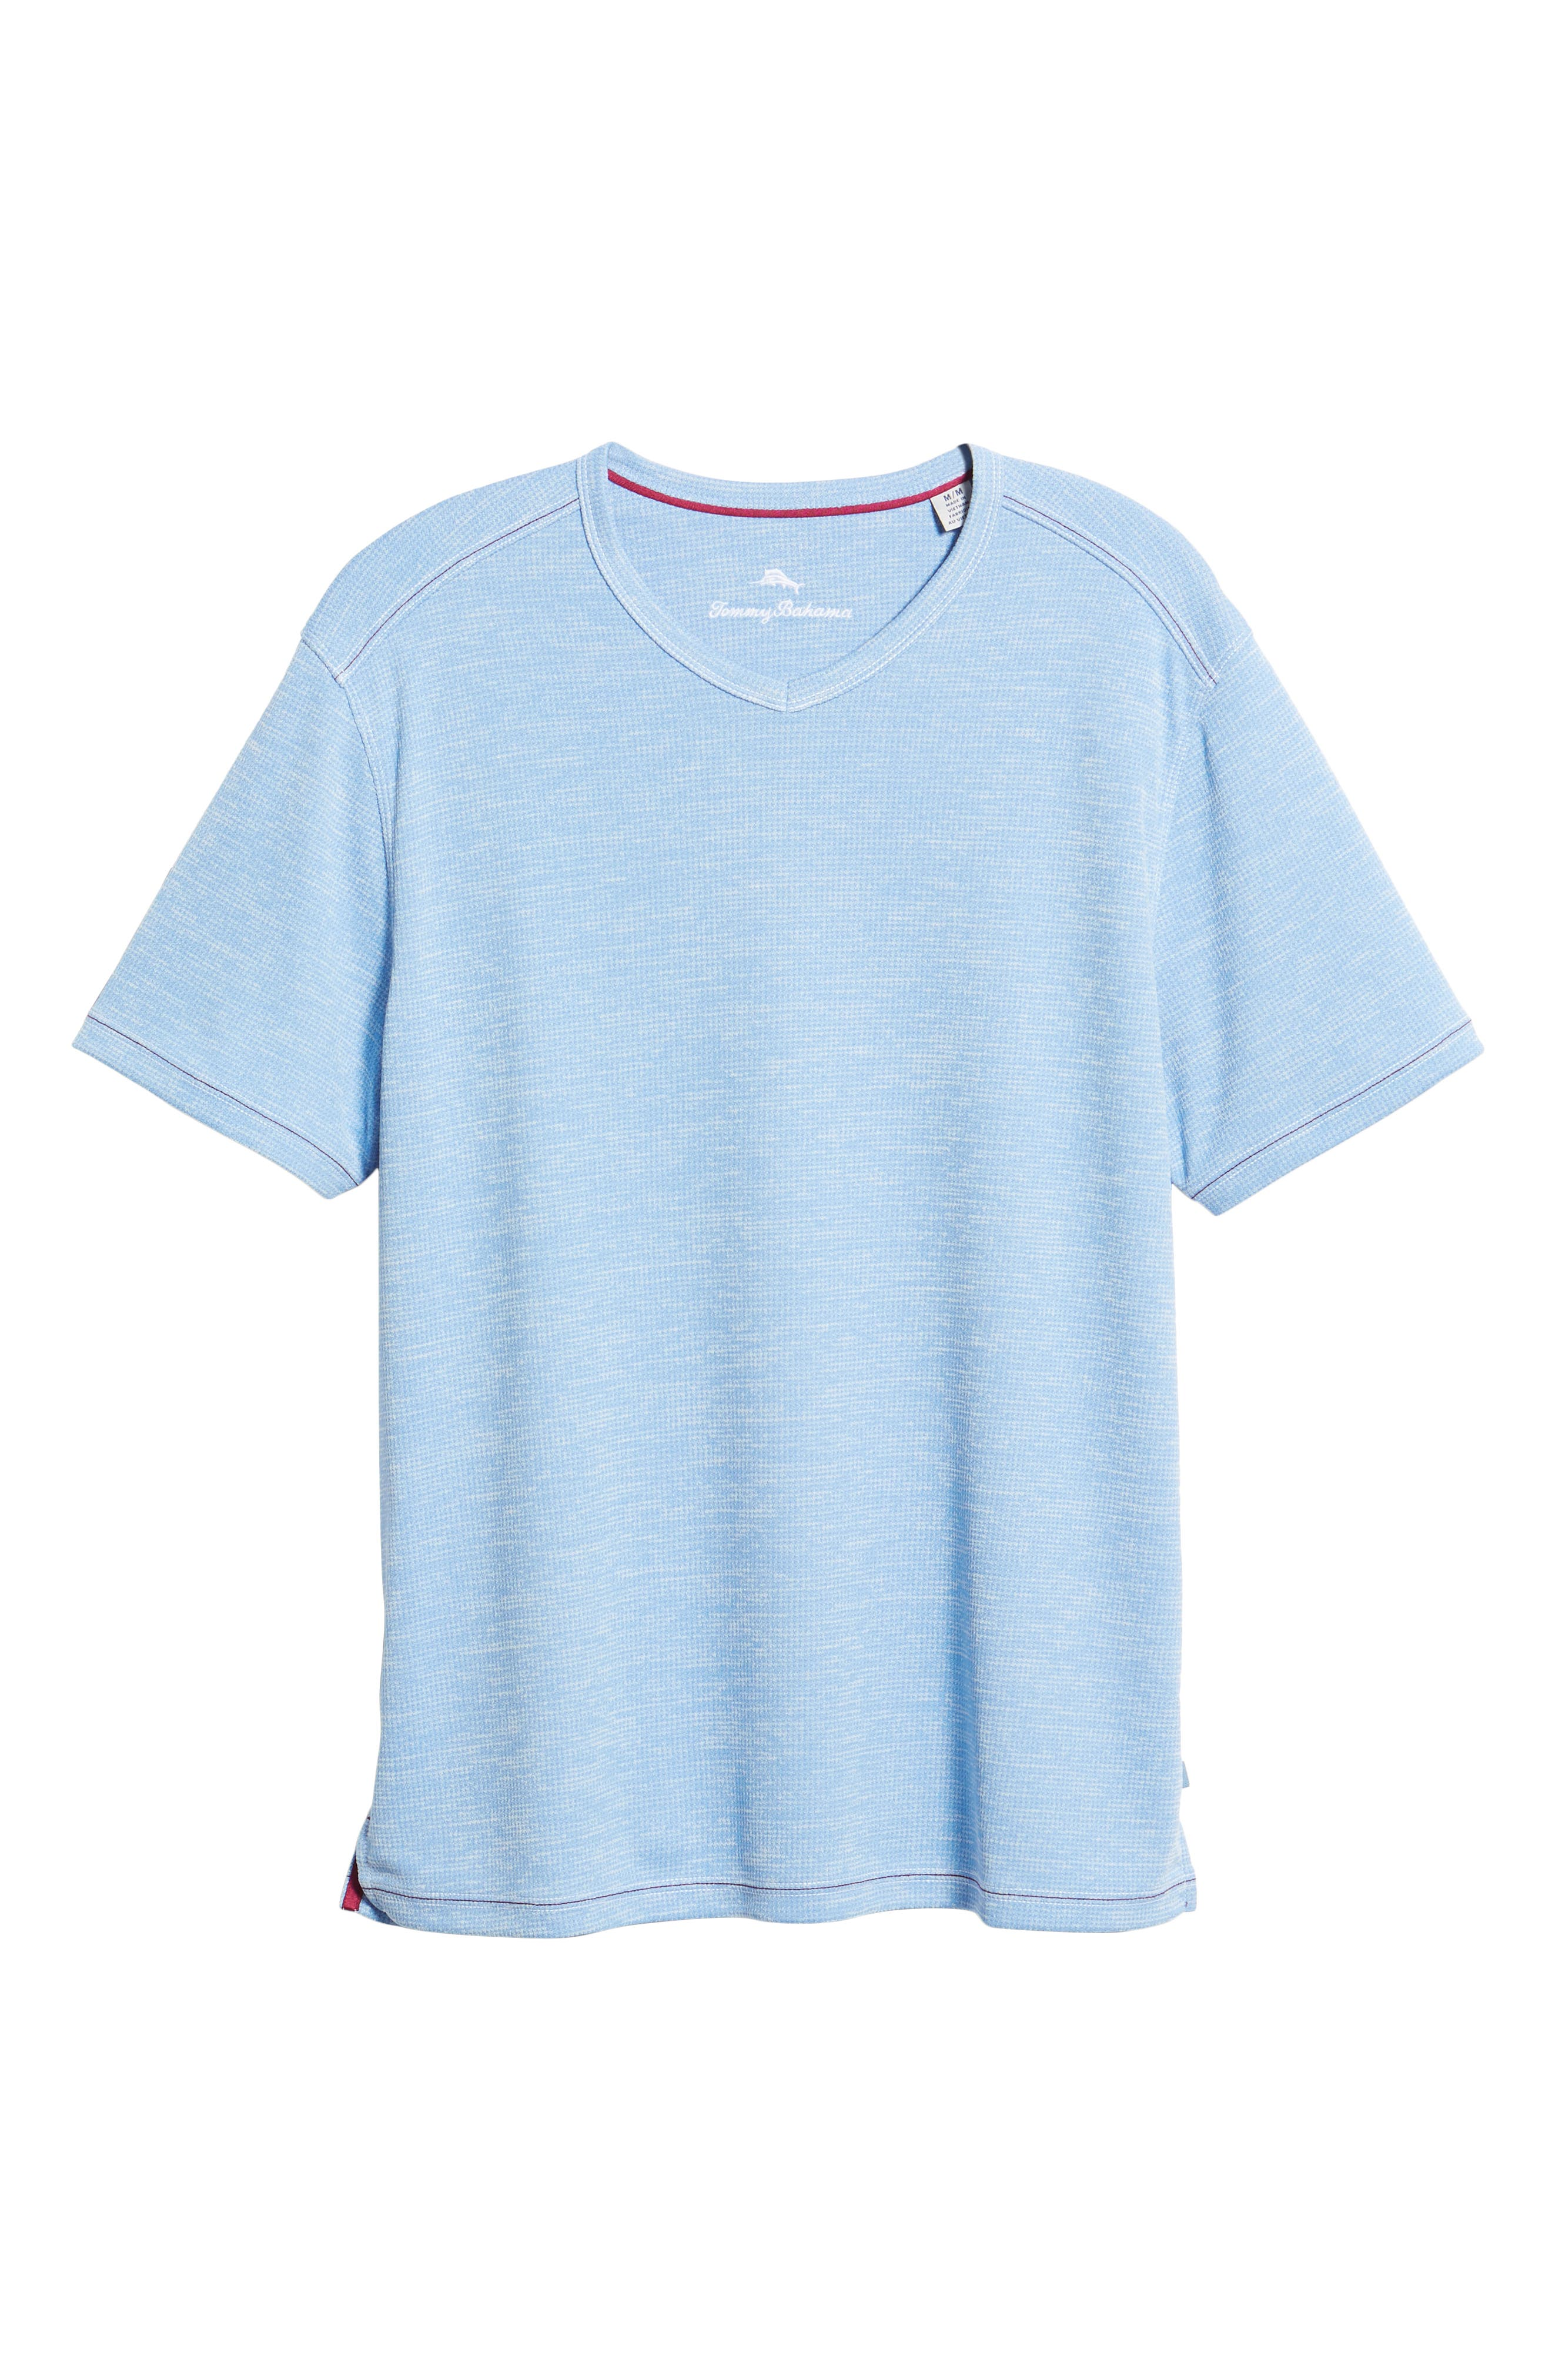 Sand Key V-Neck T-Shirt,                             Alternate thumbnail 45, color,